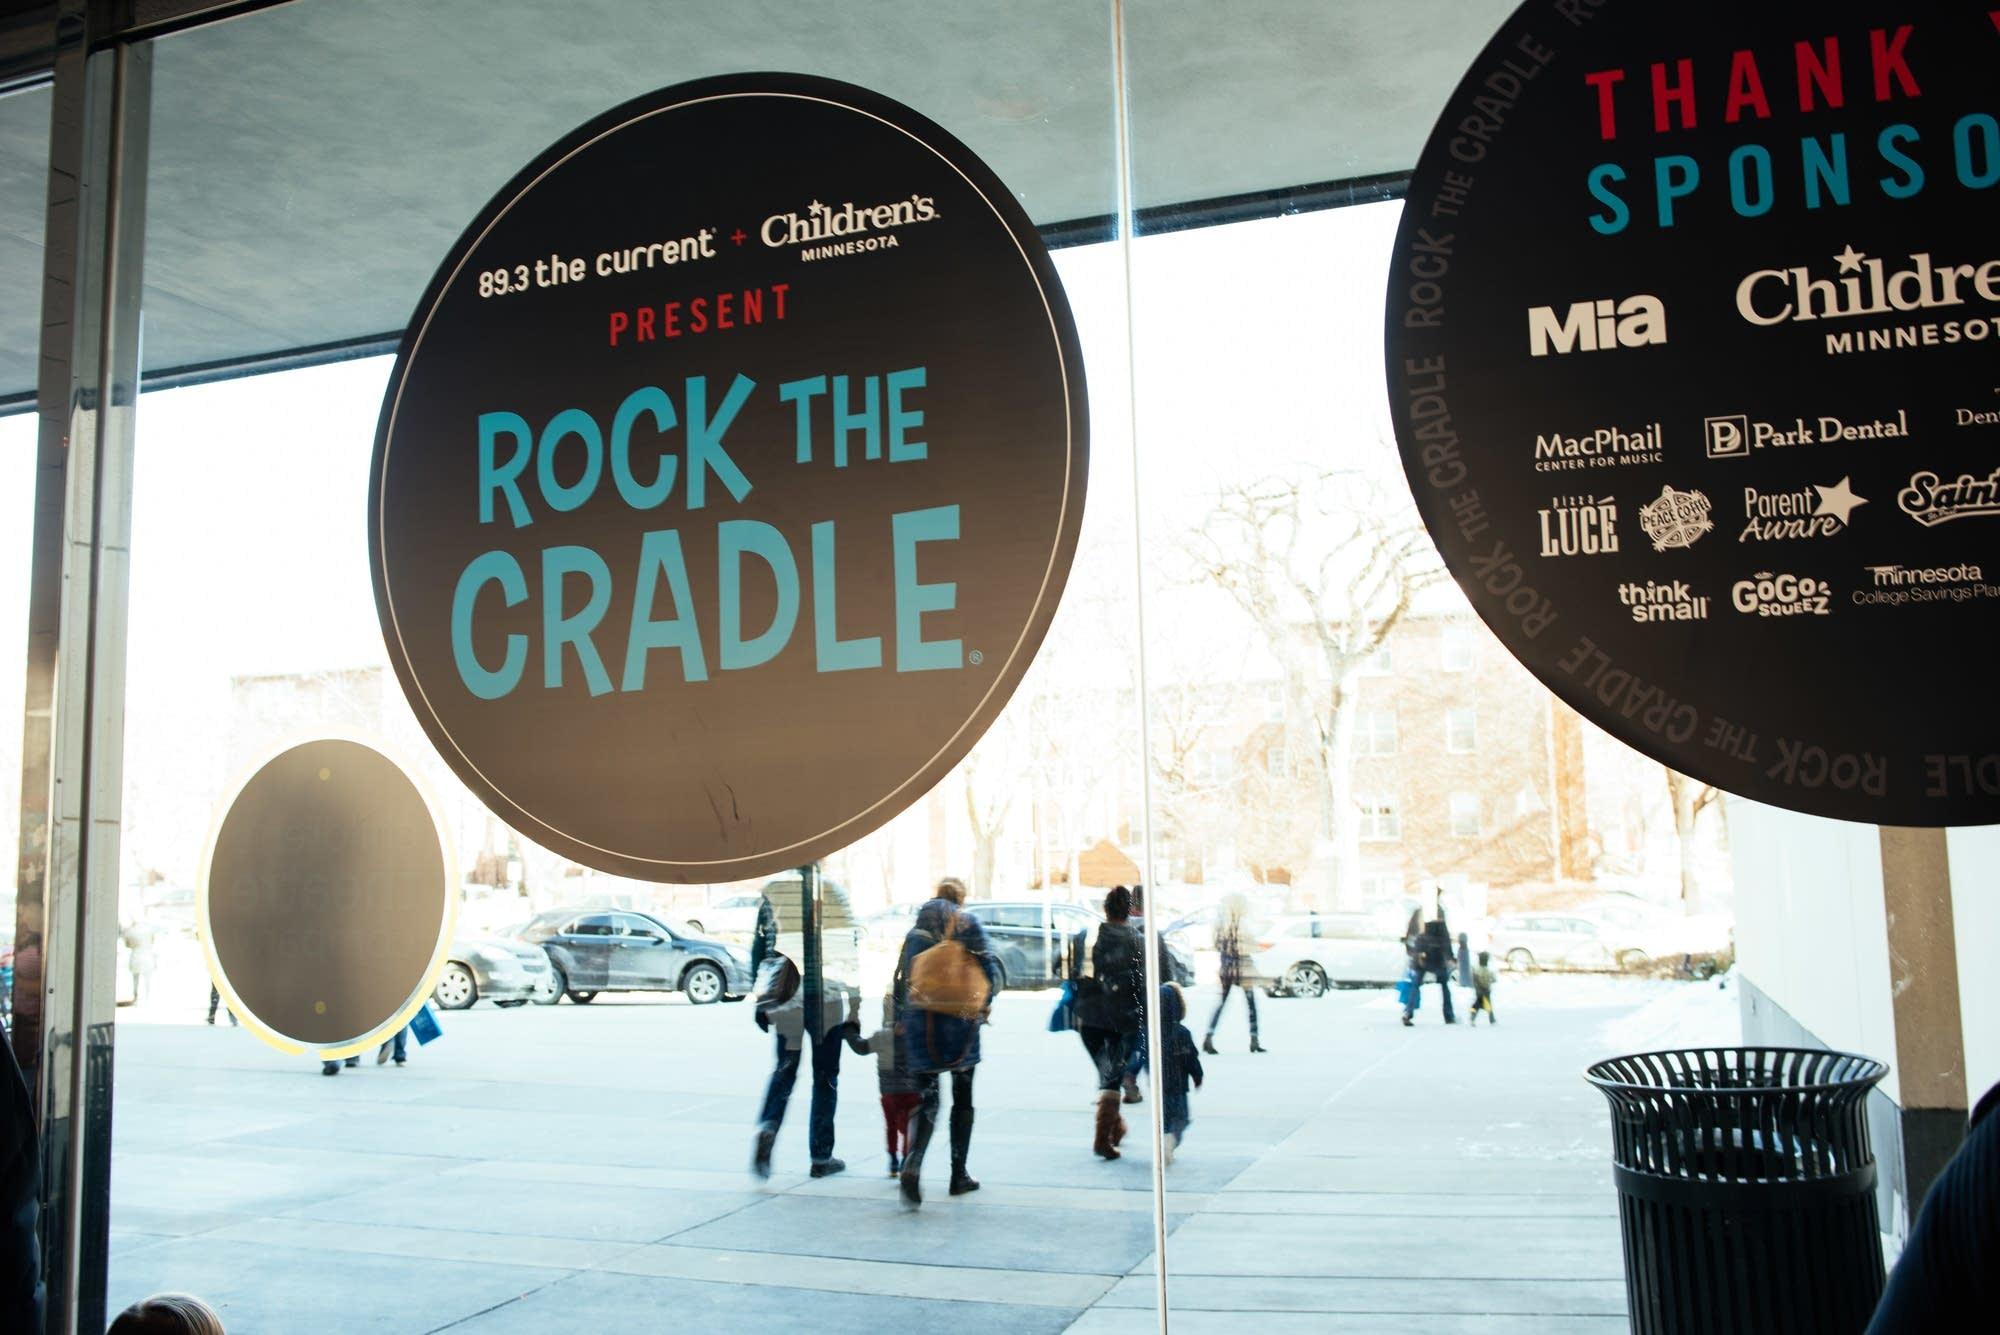 Rock the Cradle 2018